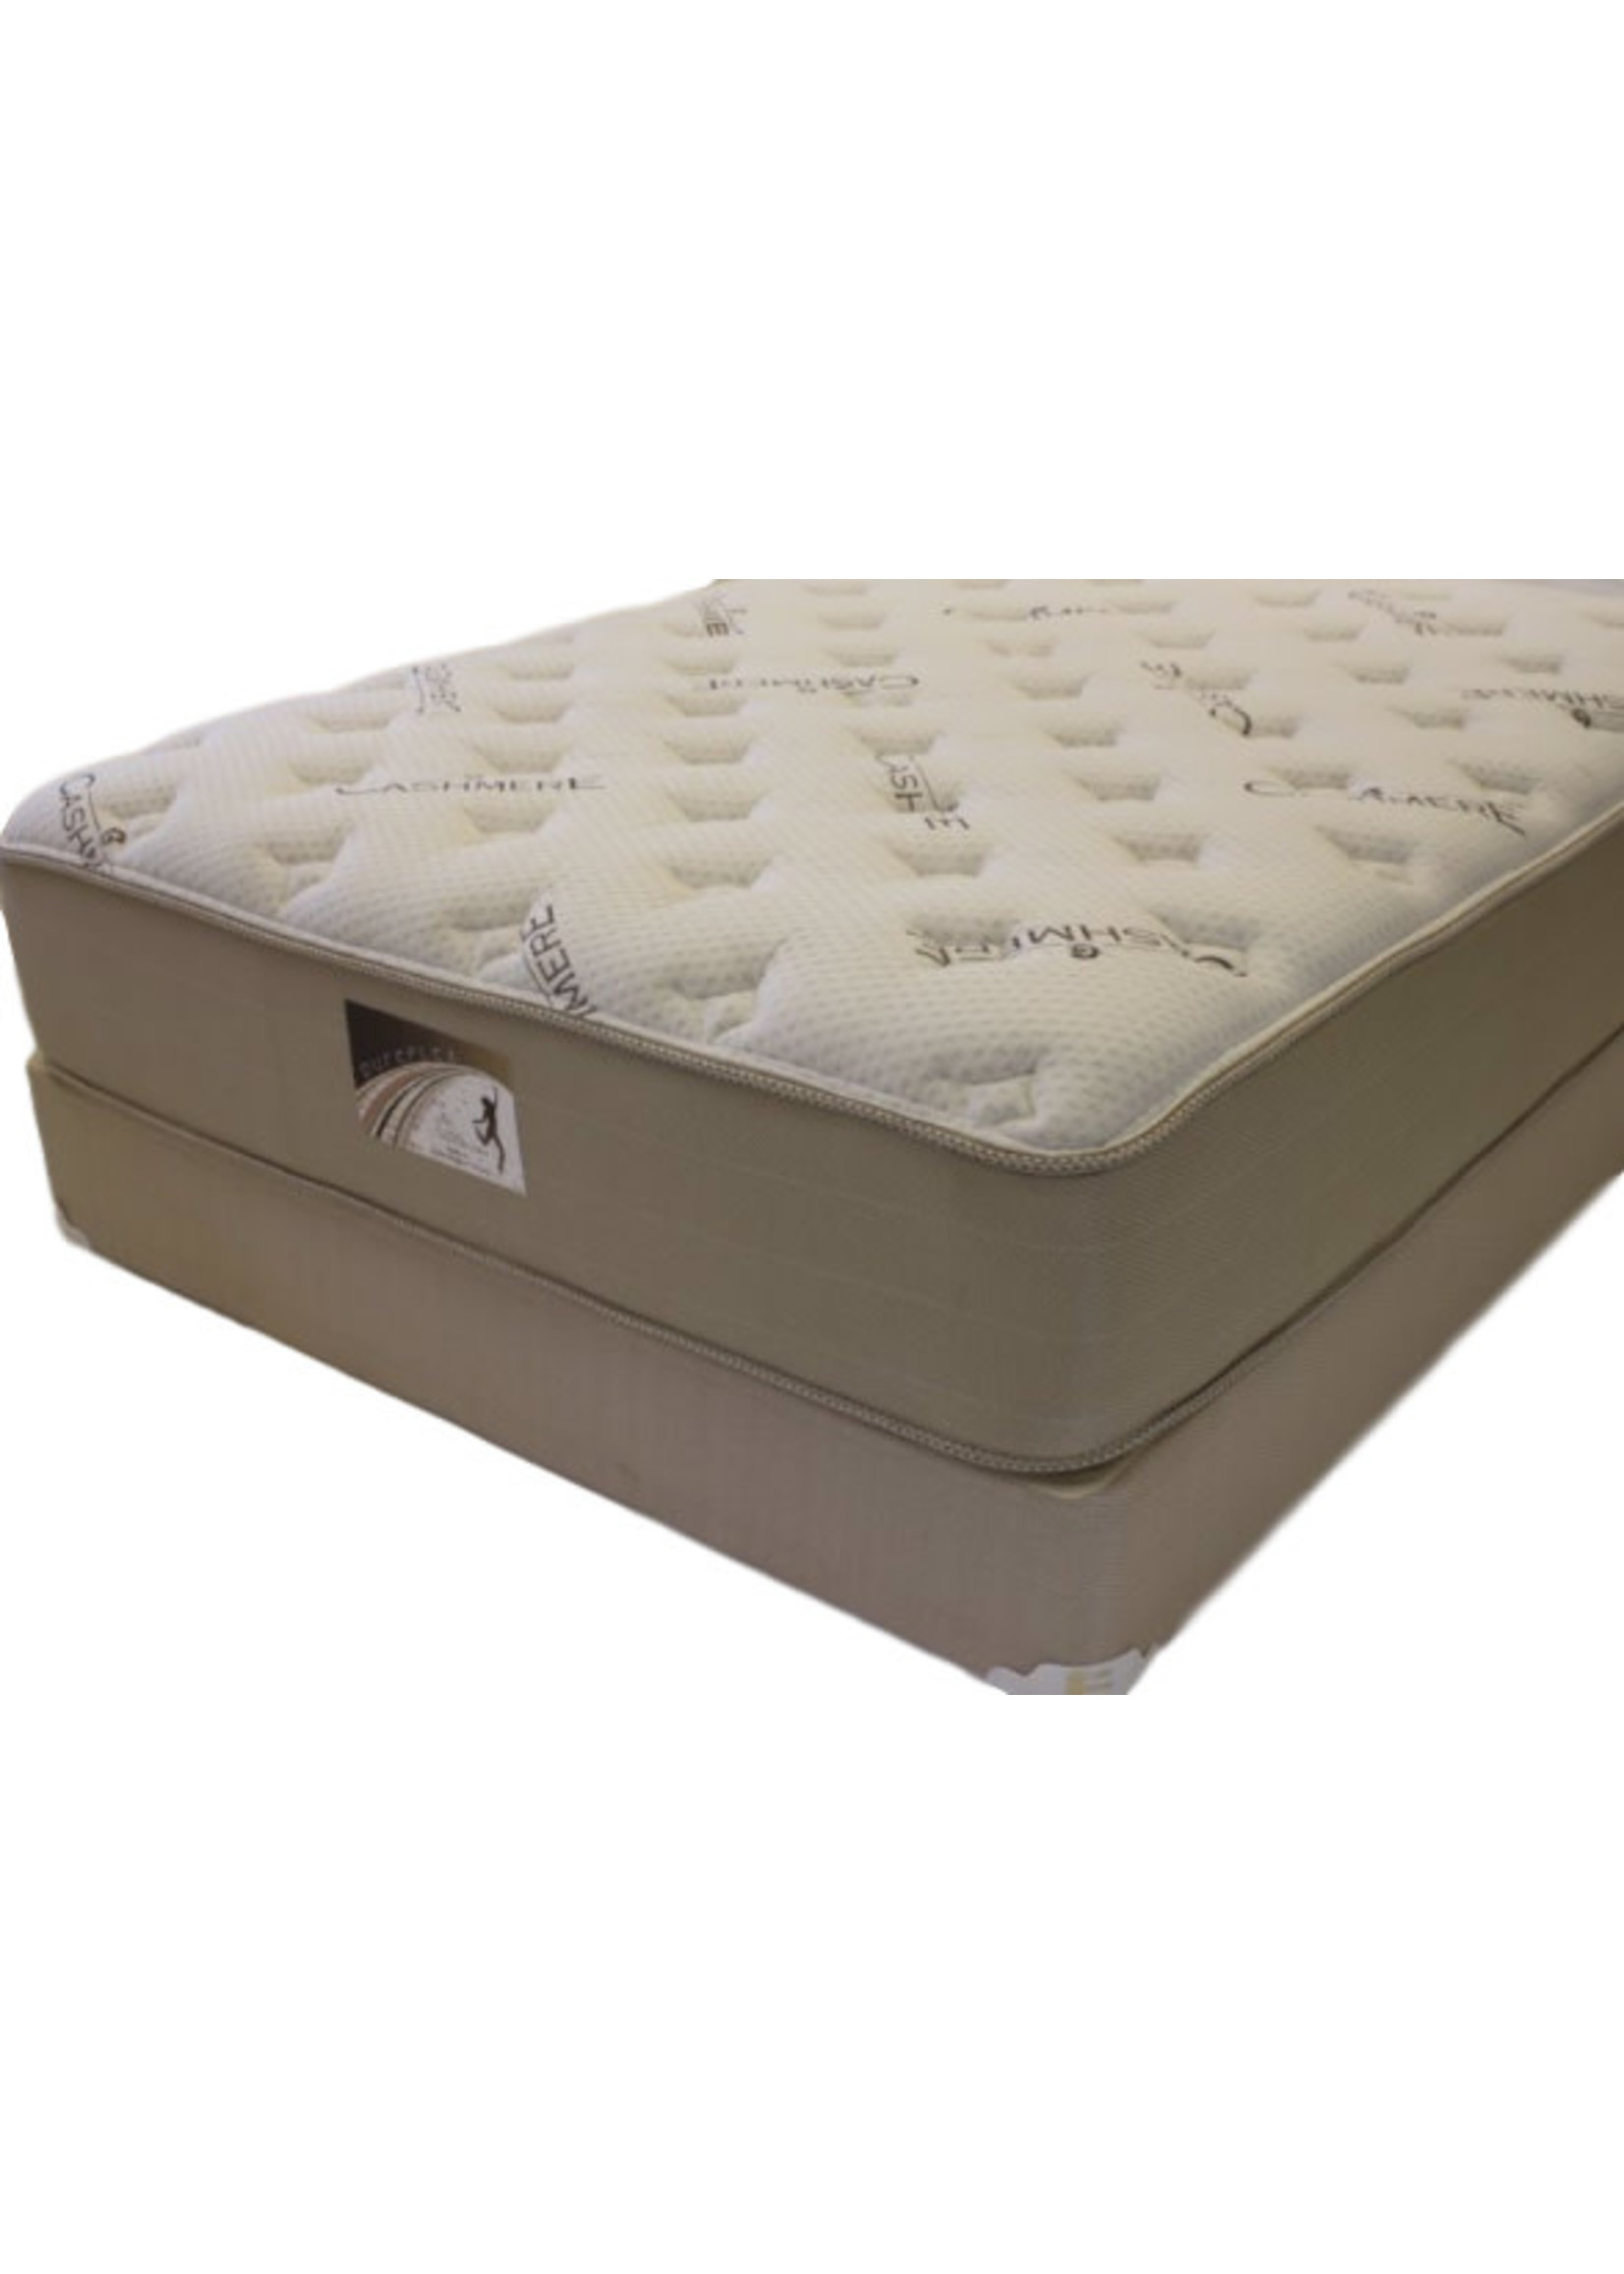 New GM Pure Comfort Queen Mattress